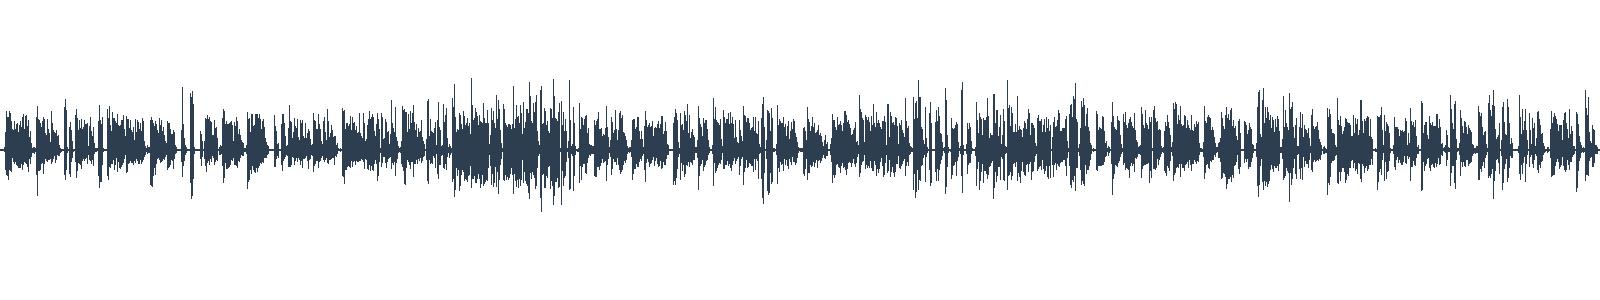 Pochovaní zaživa - Limitovaná edícia waveform